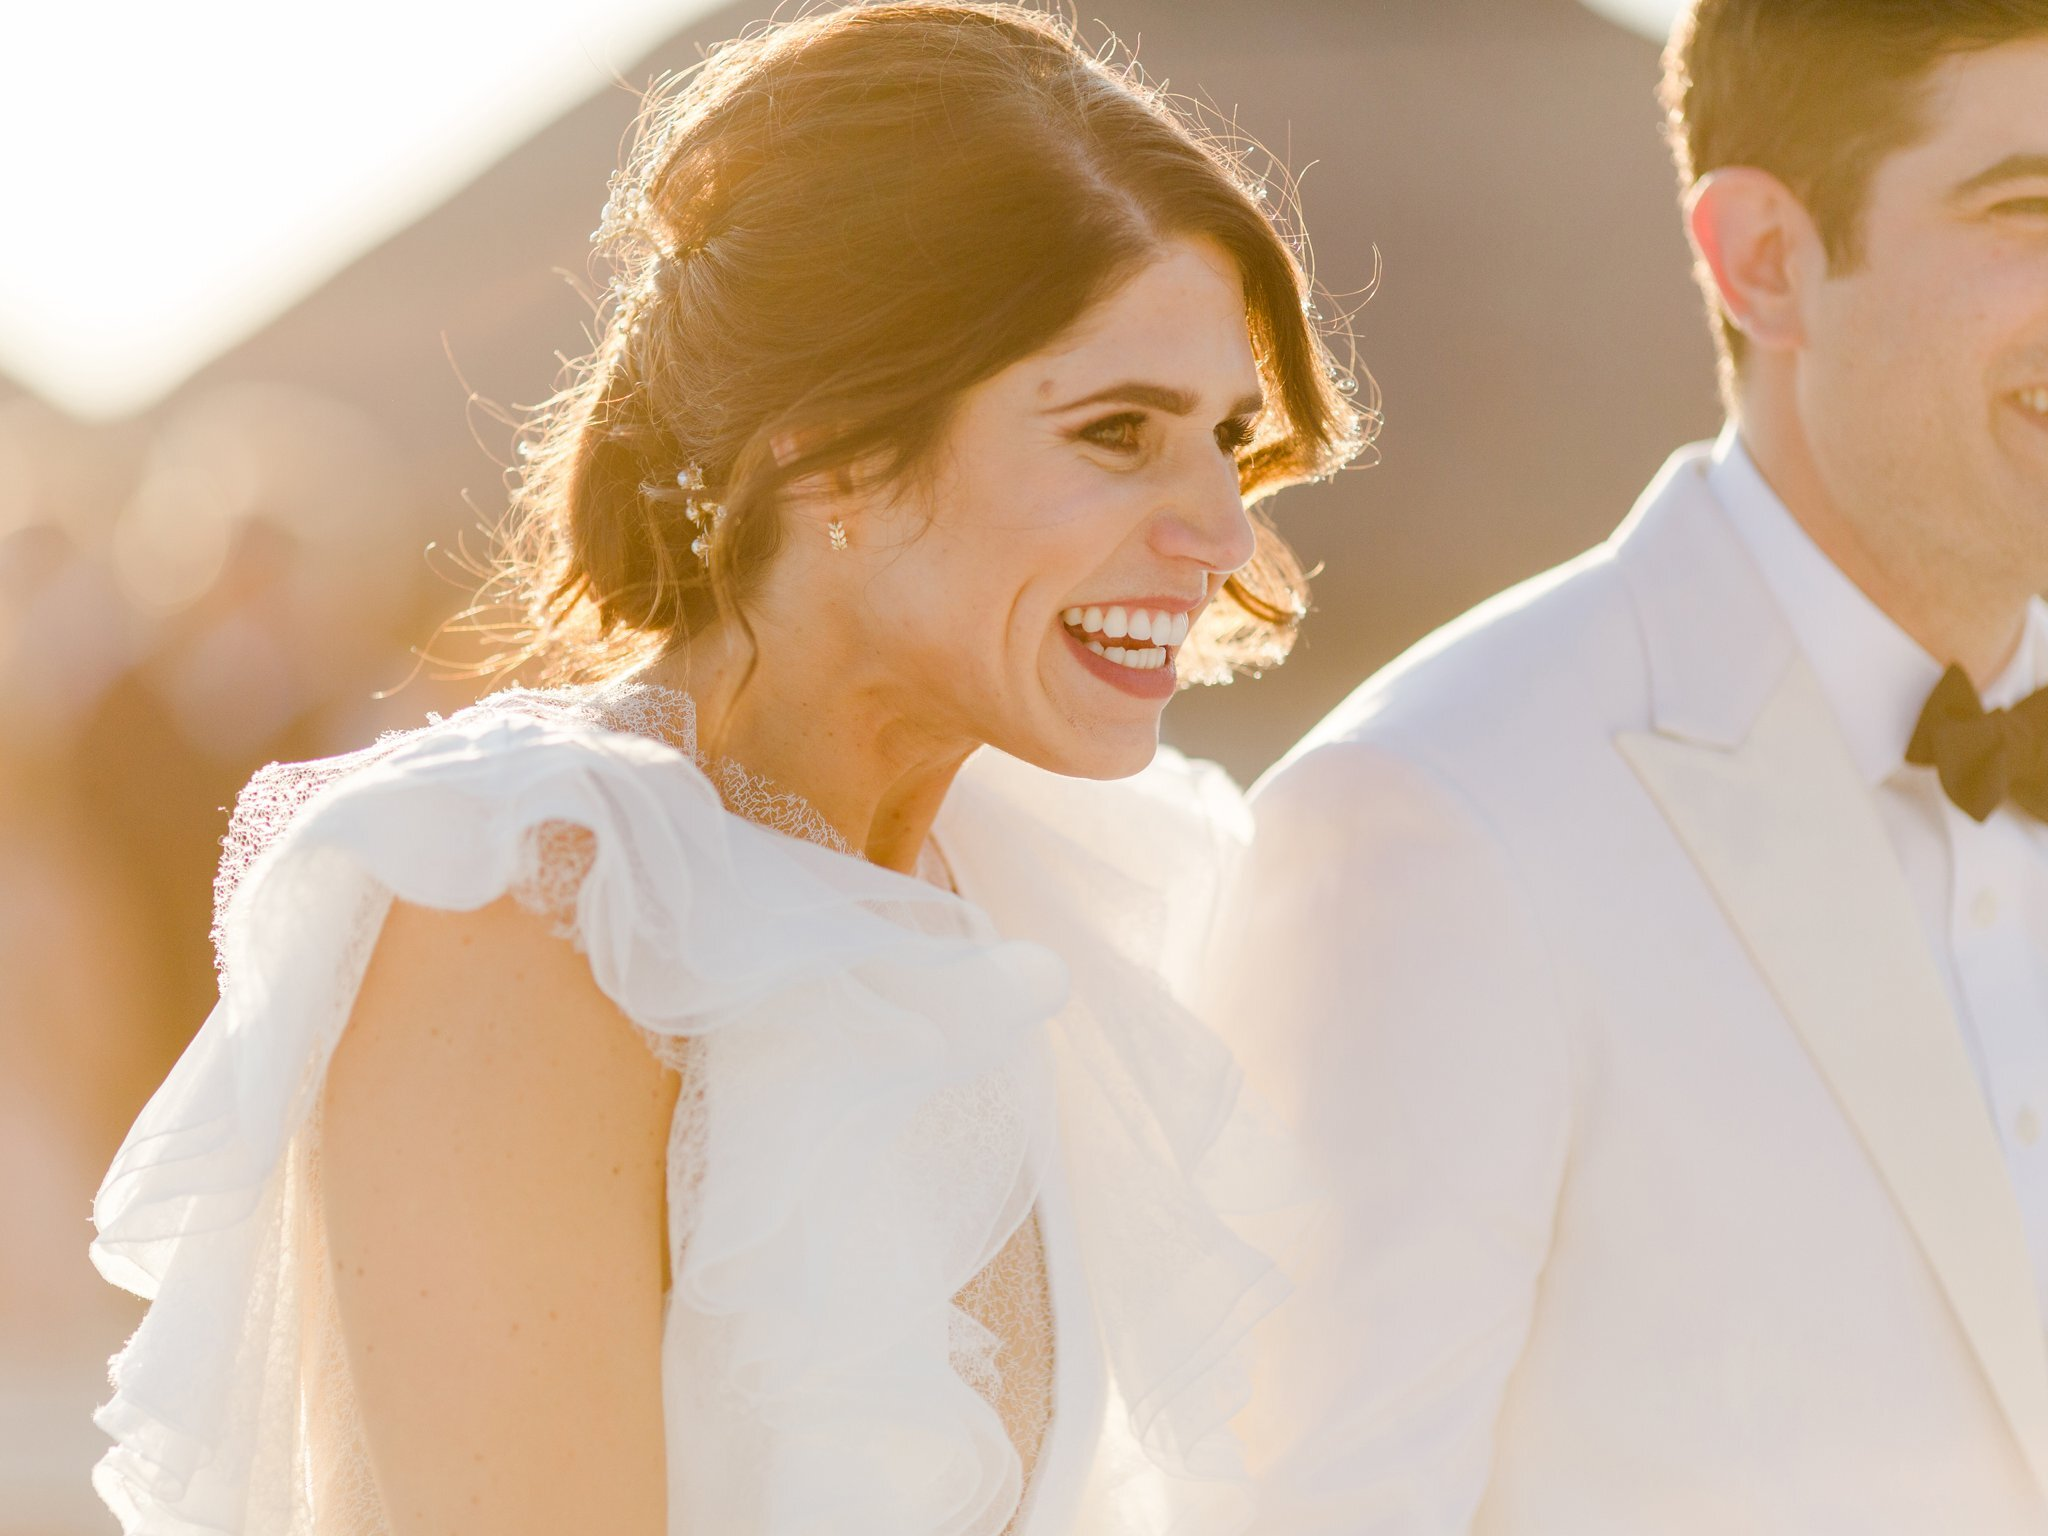 jw marriott marco island wedding photographer marco island wedding photographer shannon griffin photography_0175.jpg